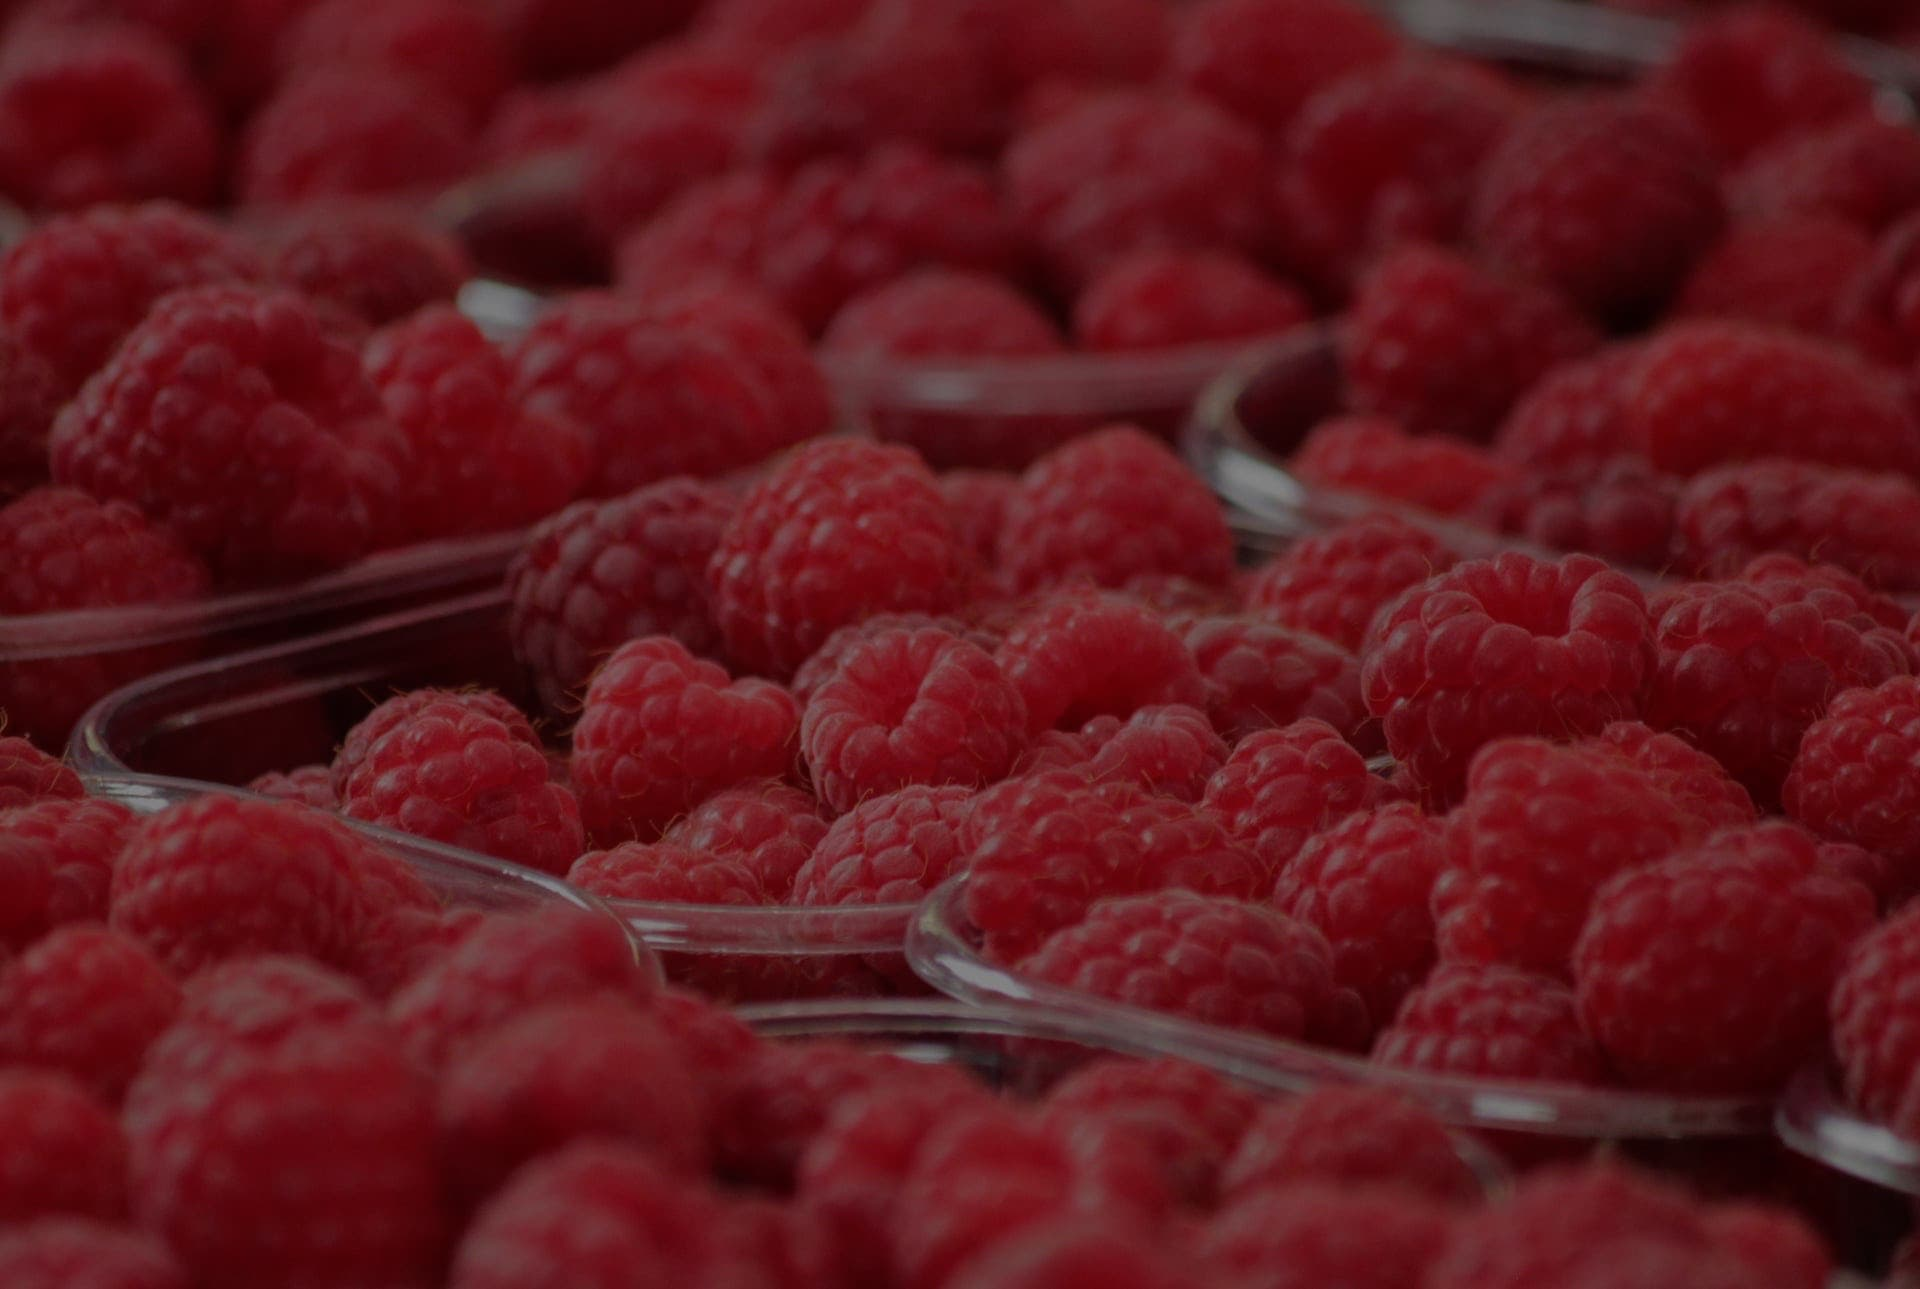 supermarche-match-wanfercee-baulet-fleurus-ra-1